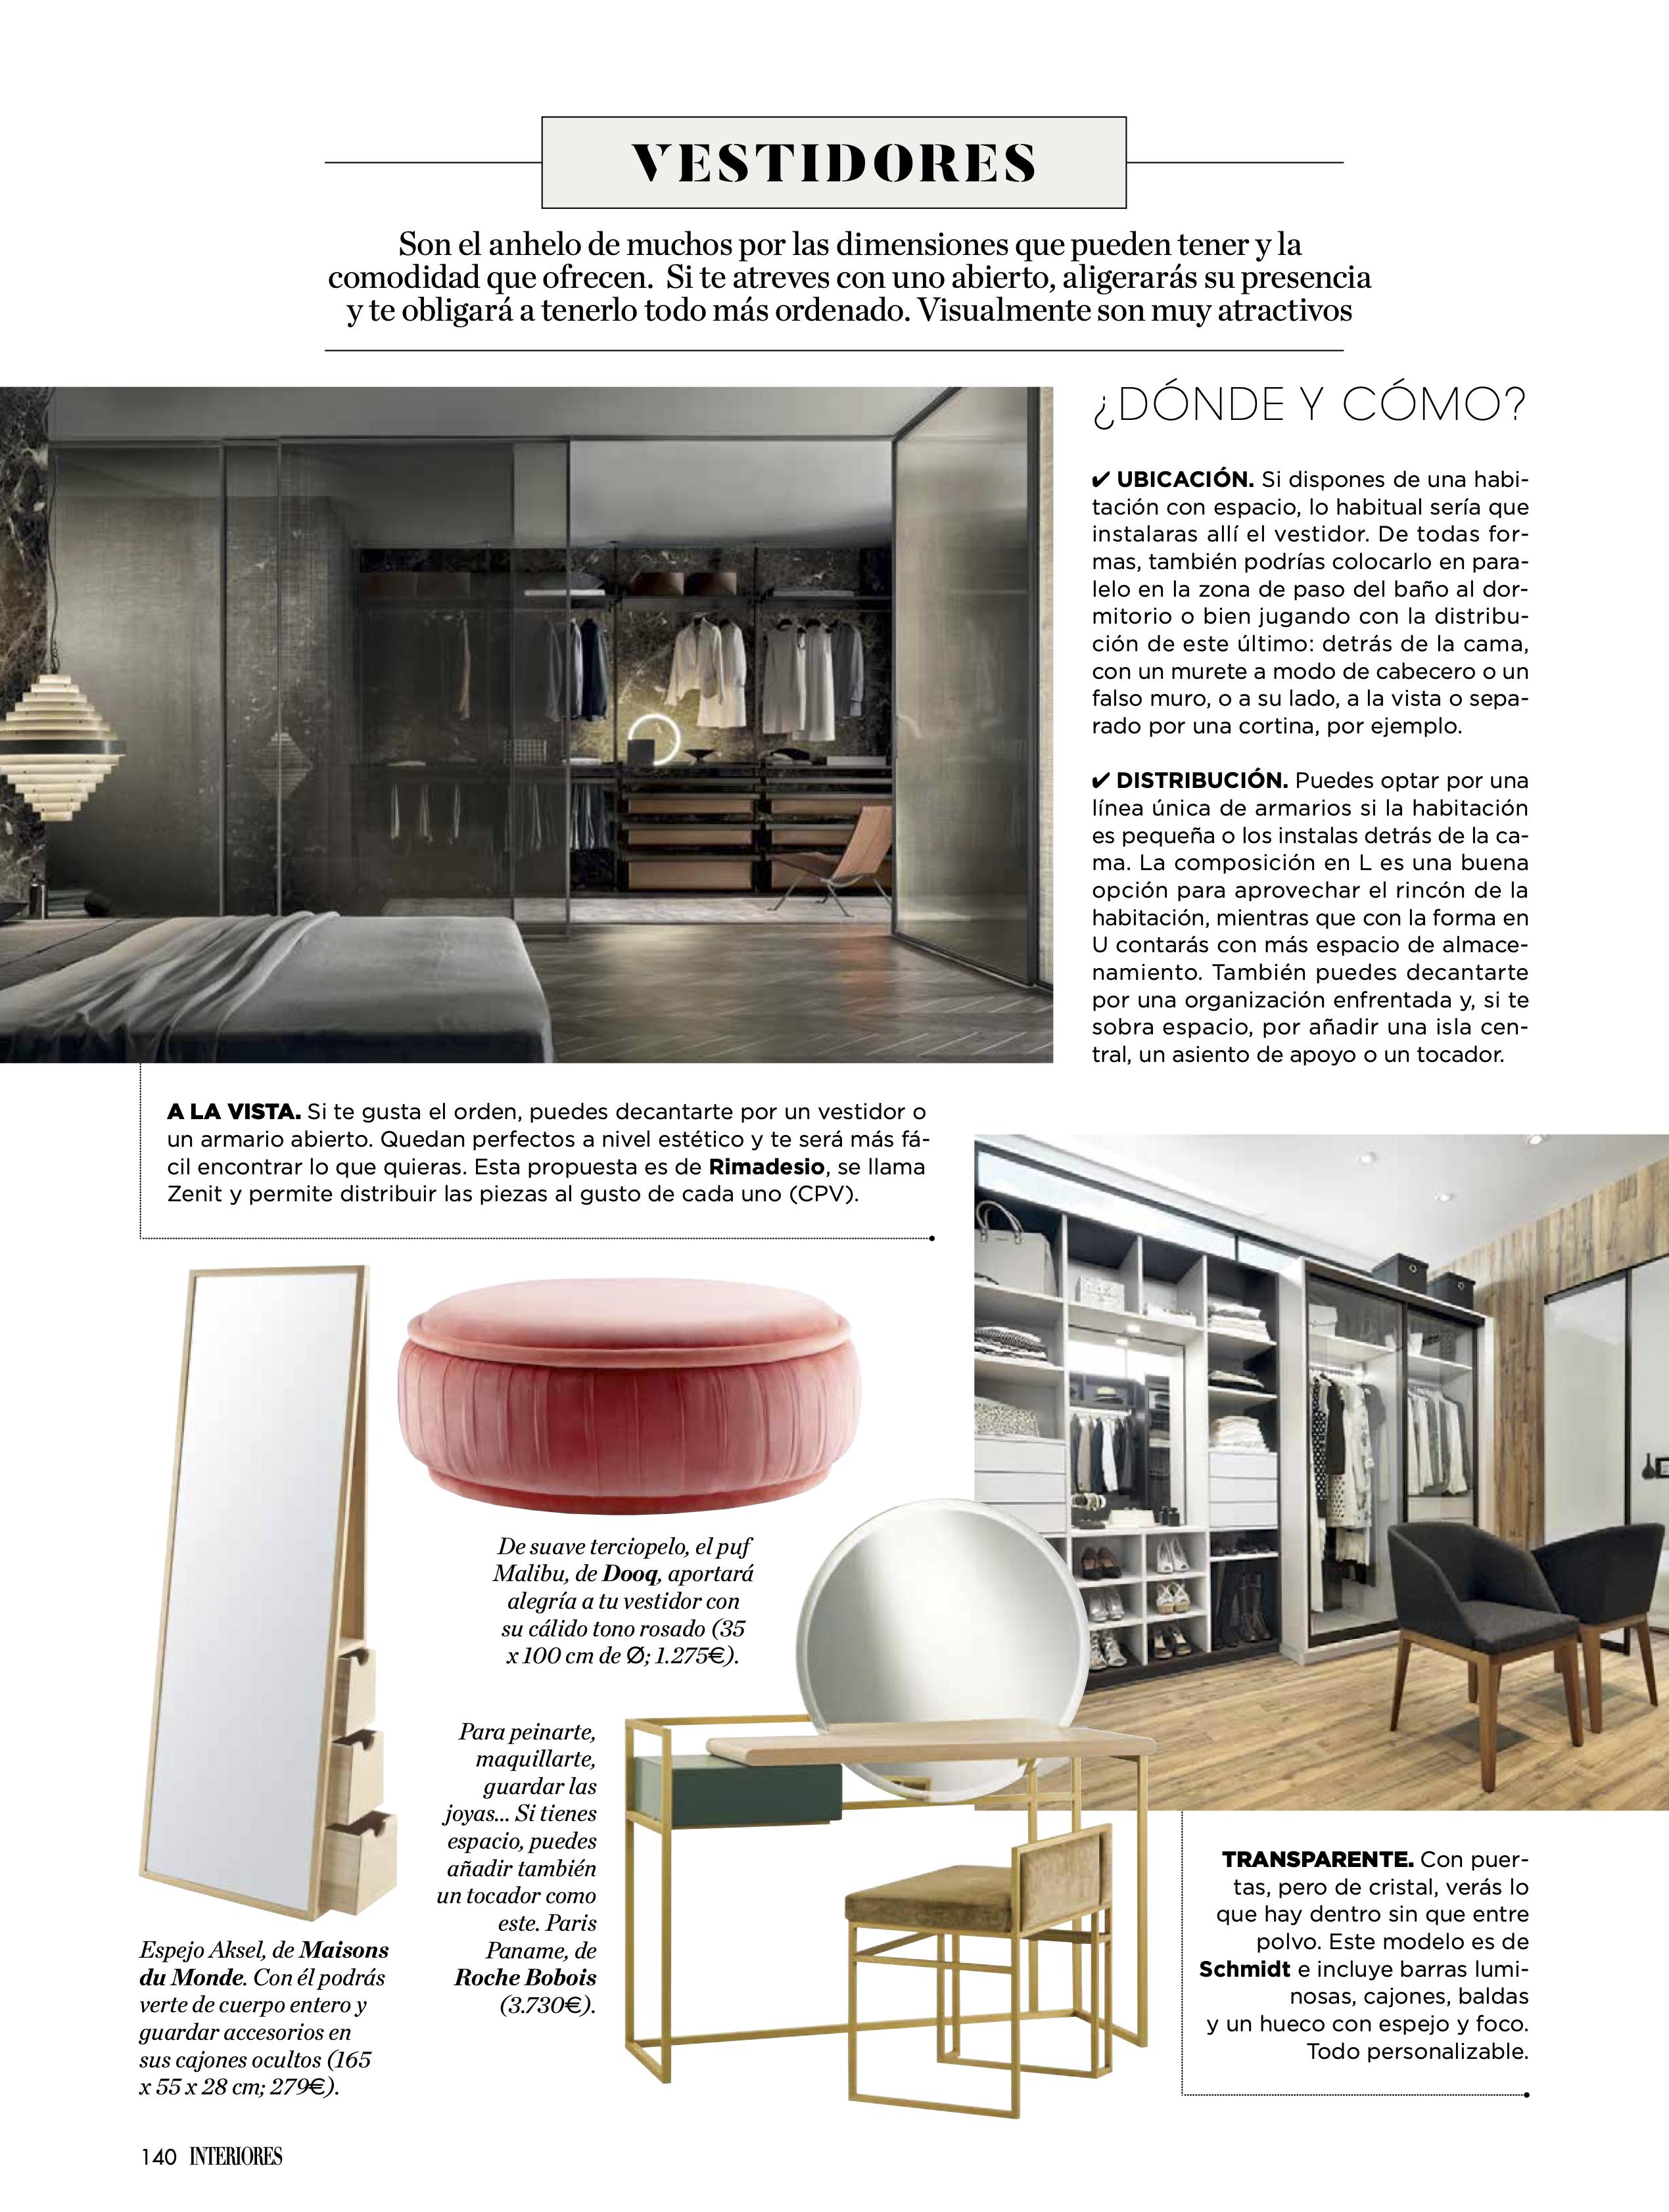 Malibu Pouf in Interiores Magazine, October '19. #dooqdetails #cabniet #editorial #magazine #feature #FindItStyleIt #SMMakeLifeBeautiful #SODomino #JungalowStyle #HowIHaven #IDCOatHome  #OneRoomChallenge #CurrentDesignSituation #ApartmentTherapy #HouseEnvy #MyDomaine #InMyDomaine #LonnyLiving #DesignSponge  #FindItStyleIt #MakeTimeForDesign #HowWeDwell #CurrentDesignSituation #SimplyStyleYourSpace #VogueLiving #MySMPHome #MyOKLStyle #InspoToYourHome #Interior_and_Living